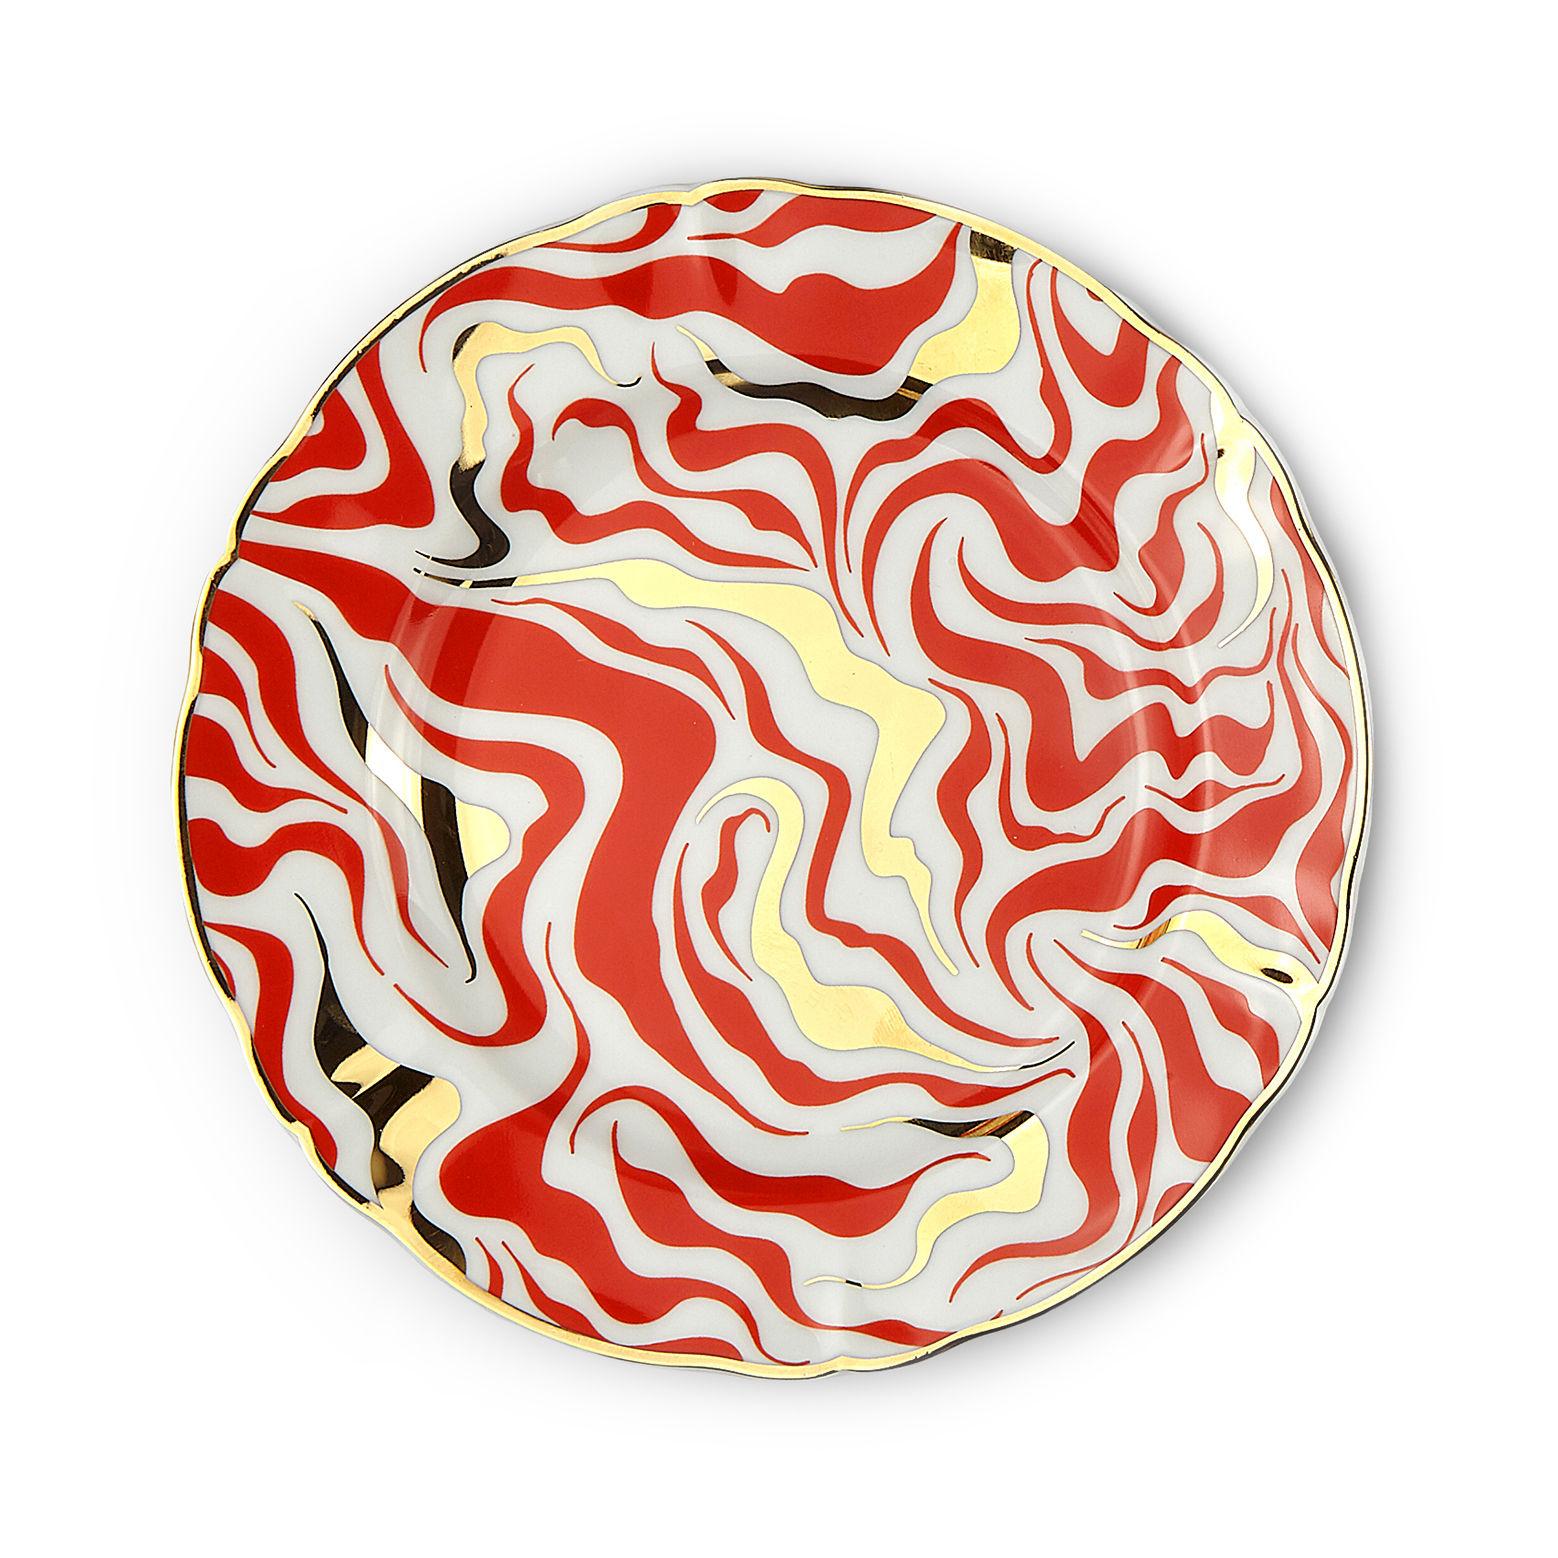 Tableware - Plates - Tempesta Dessert plate - / Ø 20.5 cm by Bitossi Home - Storm - China